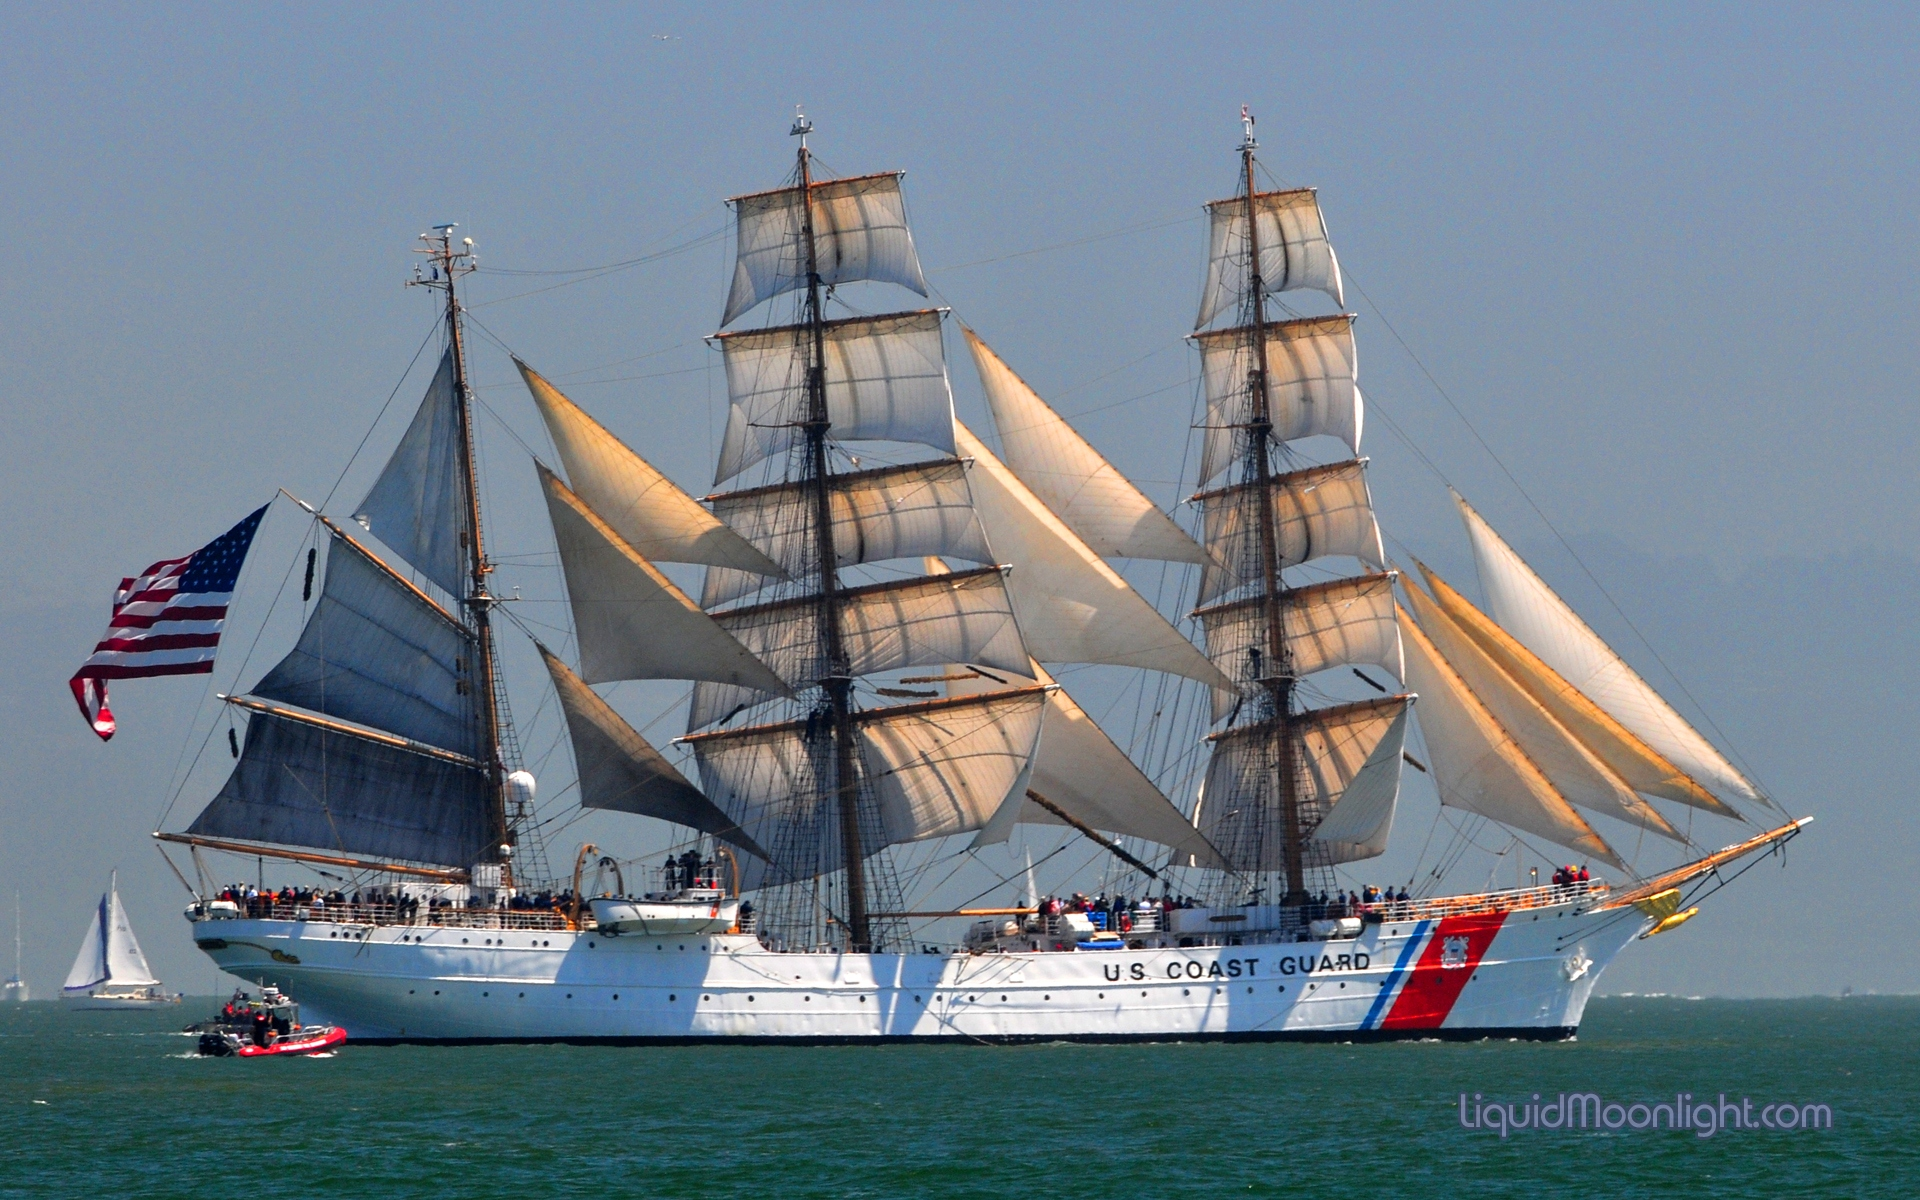 Free Download Fluidr United States Coast Guard Cutter Barque Eagle